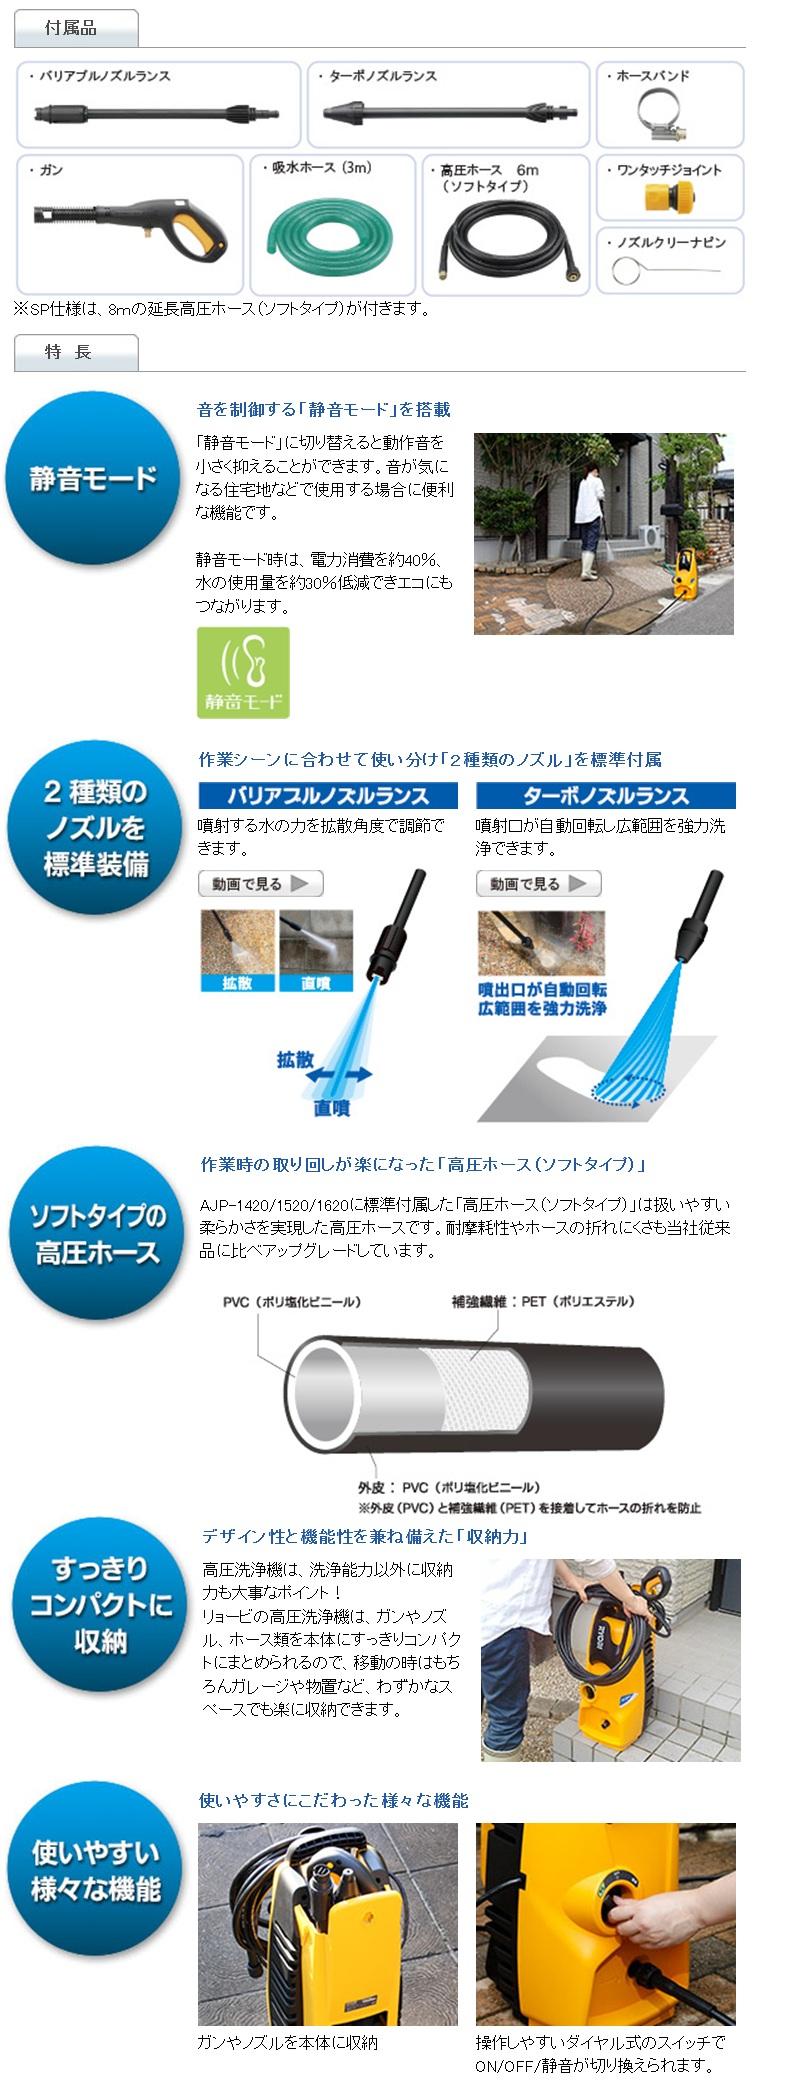 リョービ 高圧洗浄機 AJP-1520/AJP-1520SP